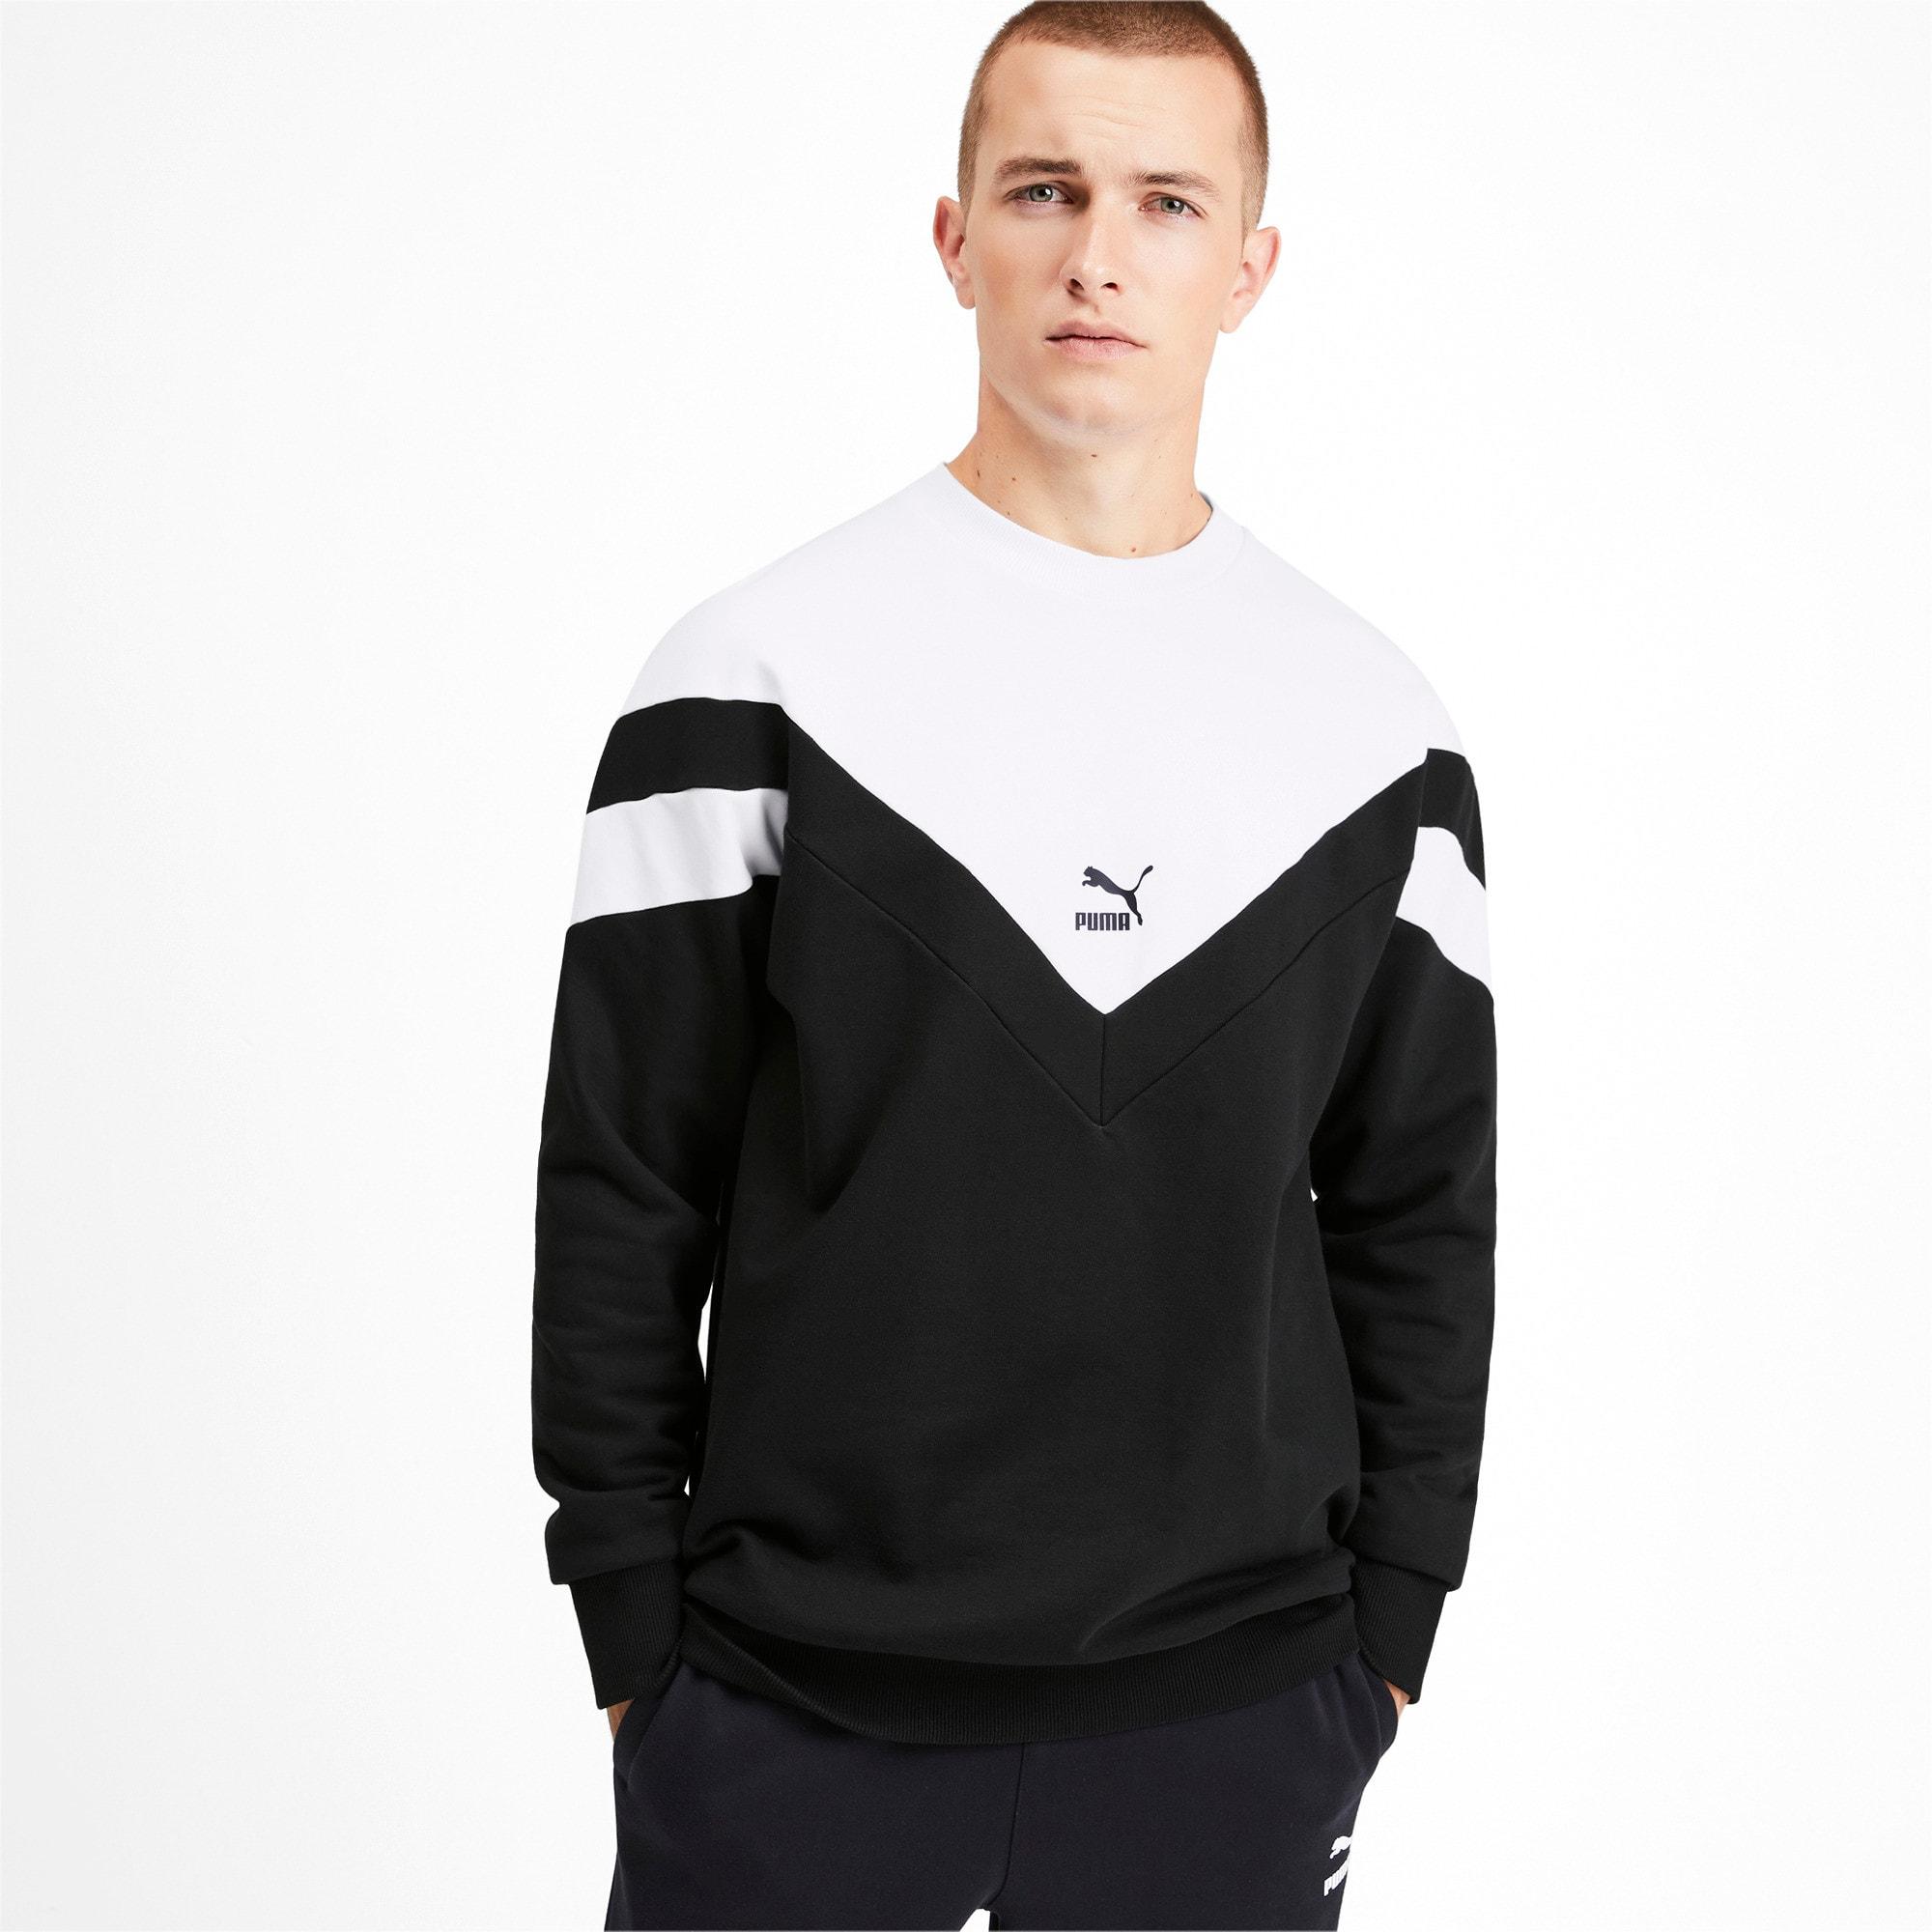 Thumbnail 2 of Iconic MCS Herren Sweatshirt, Puma Black, medium